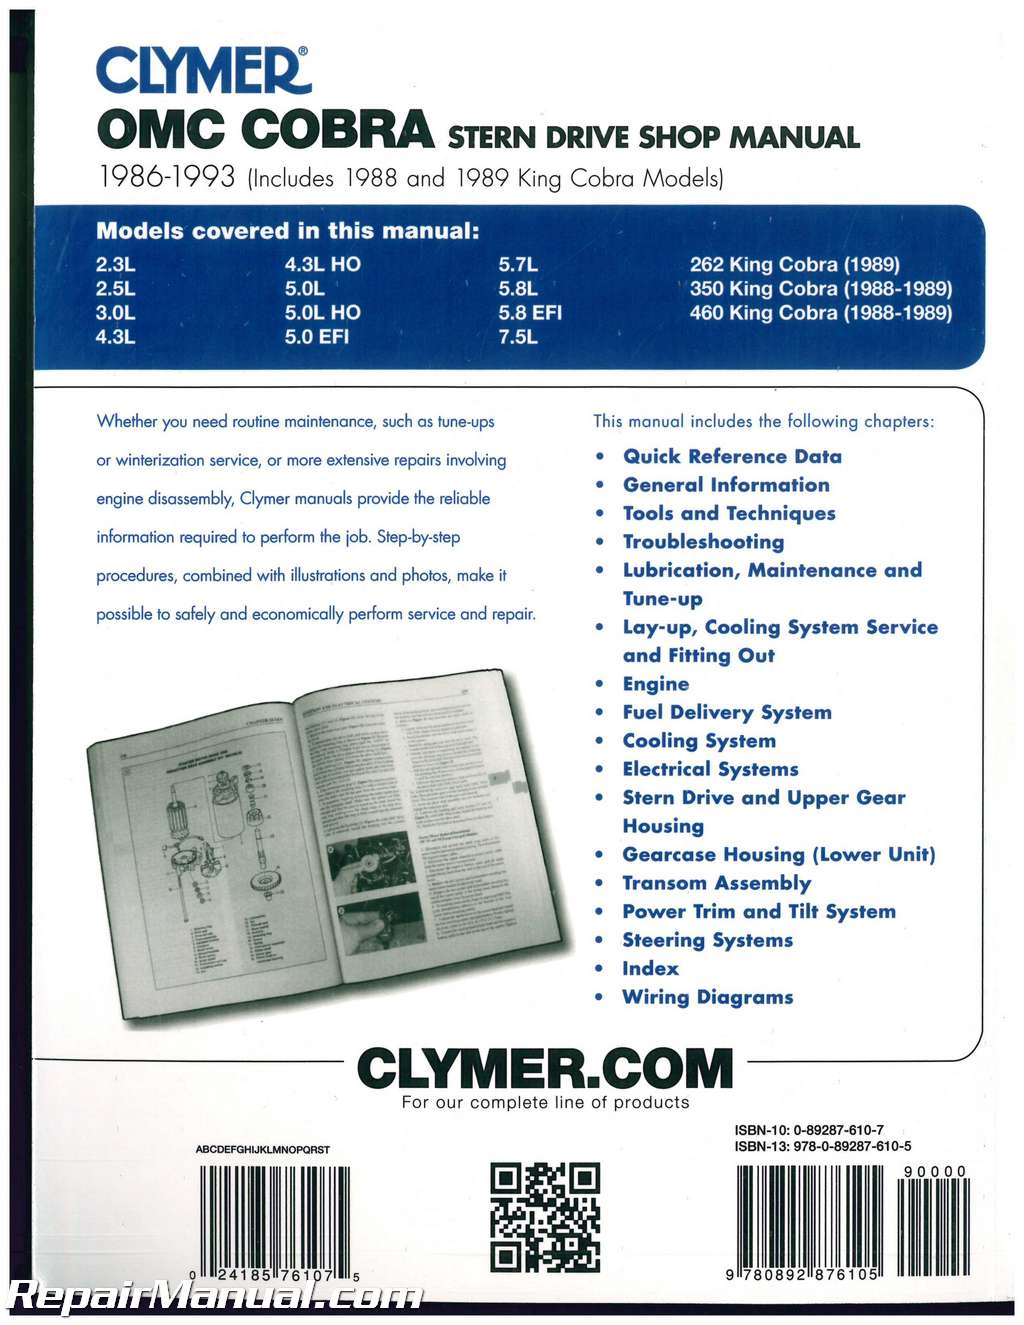 1993 johnson owner manual